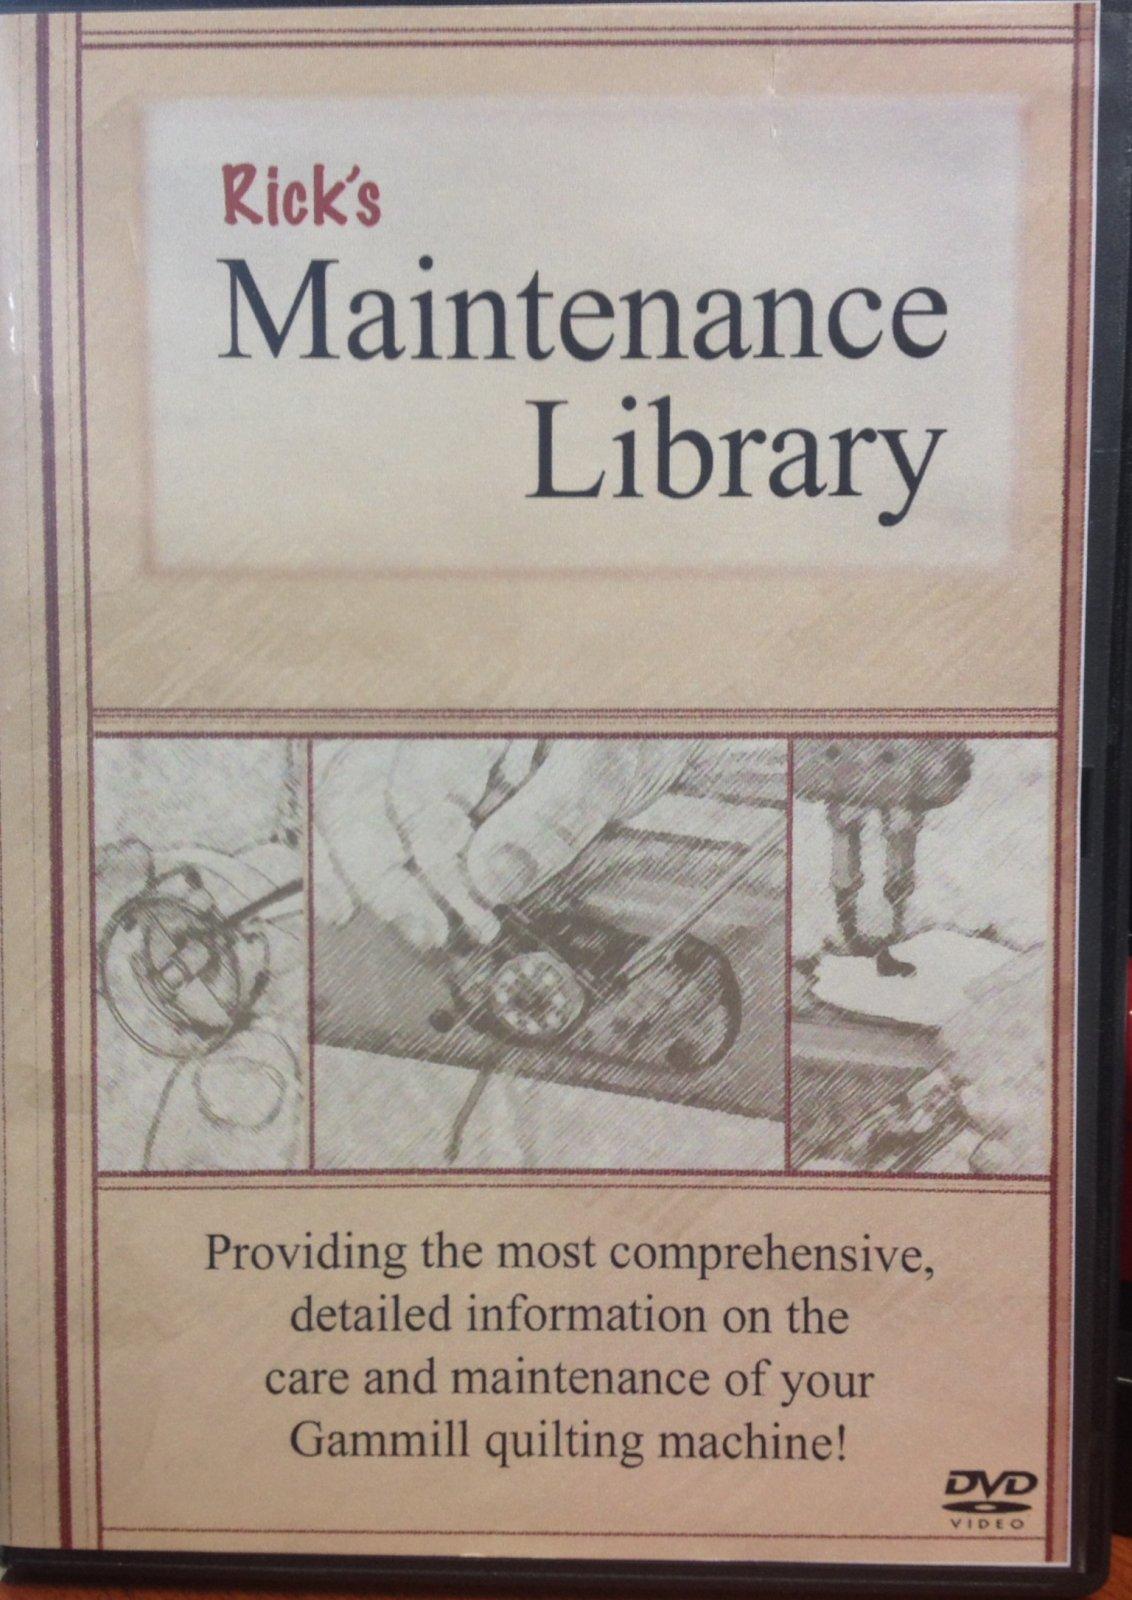 Rick's Maintenance Library